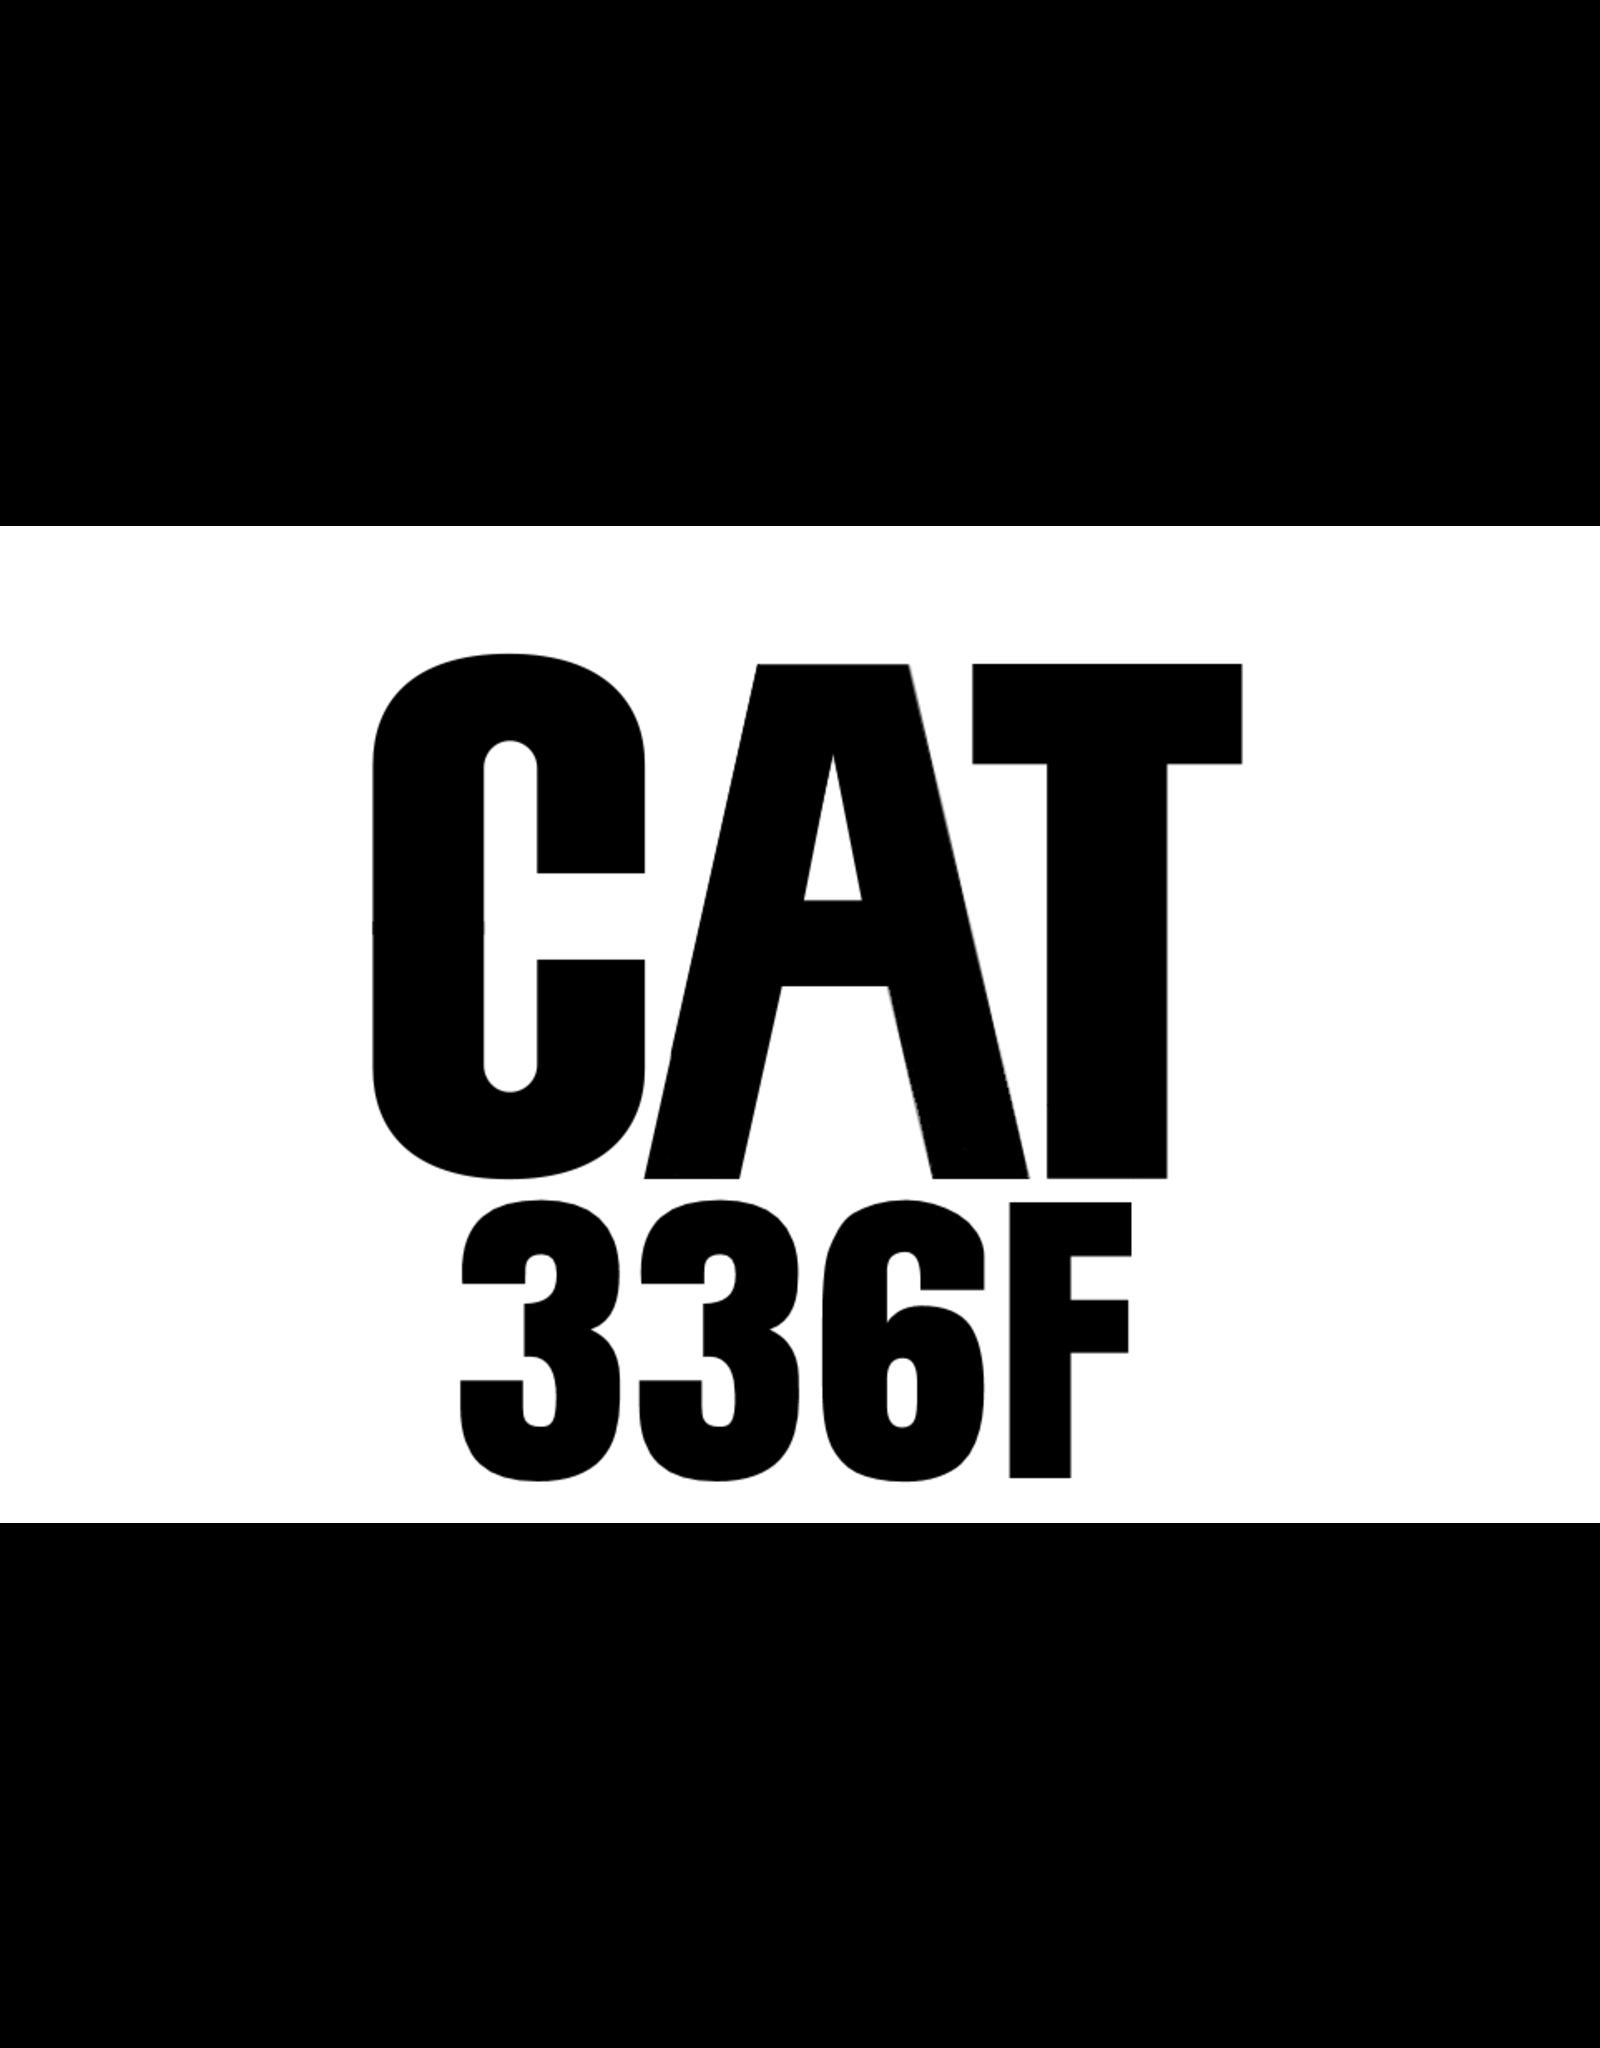 Echle Hartstahl GmbH FOPS for CAT 336F